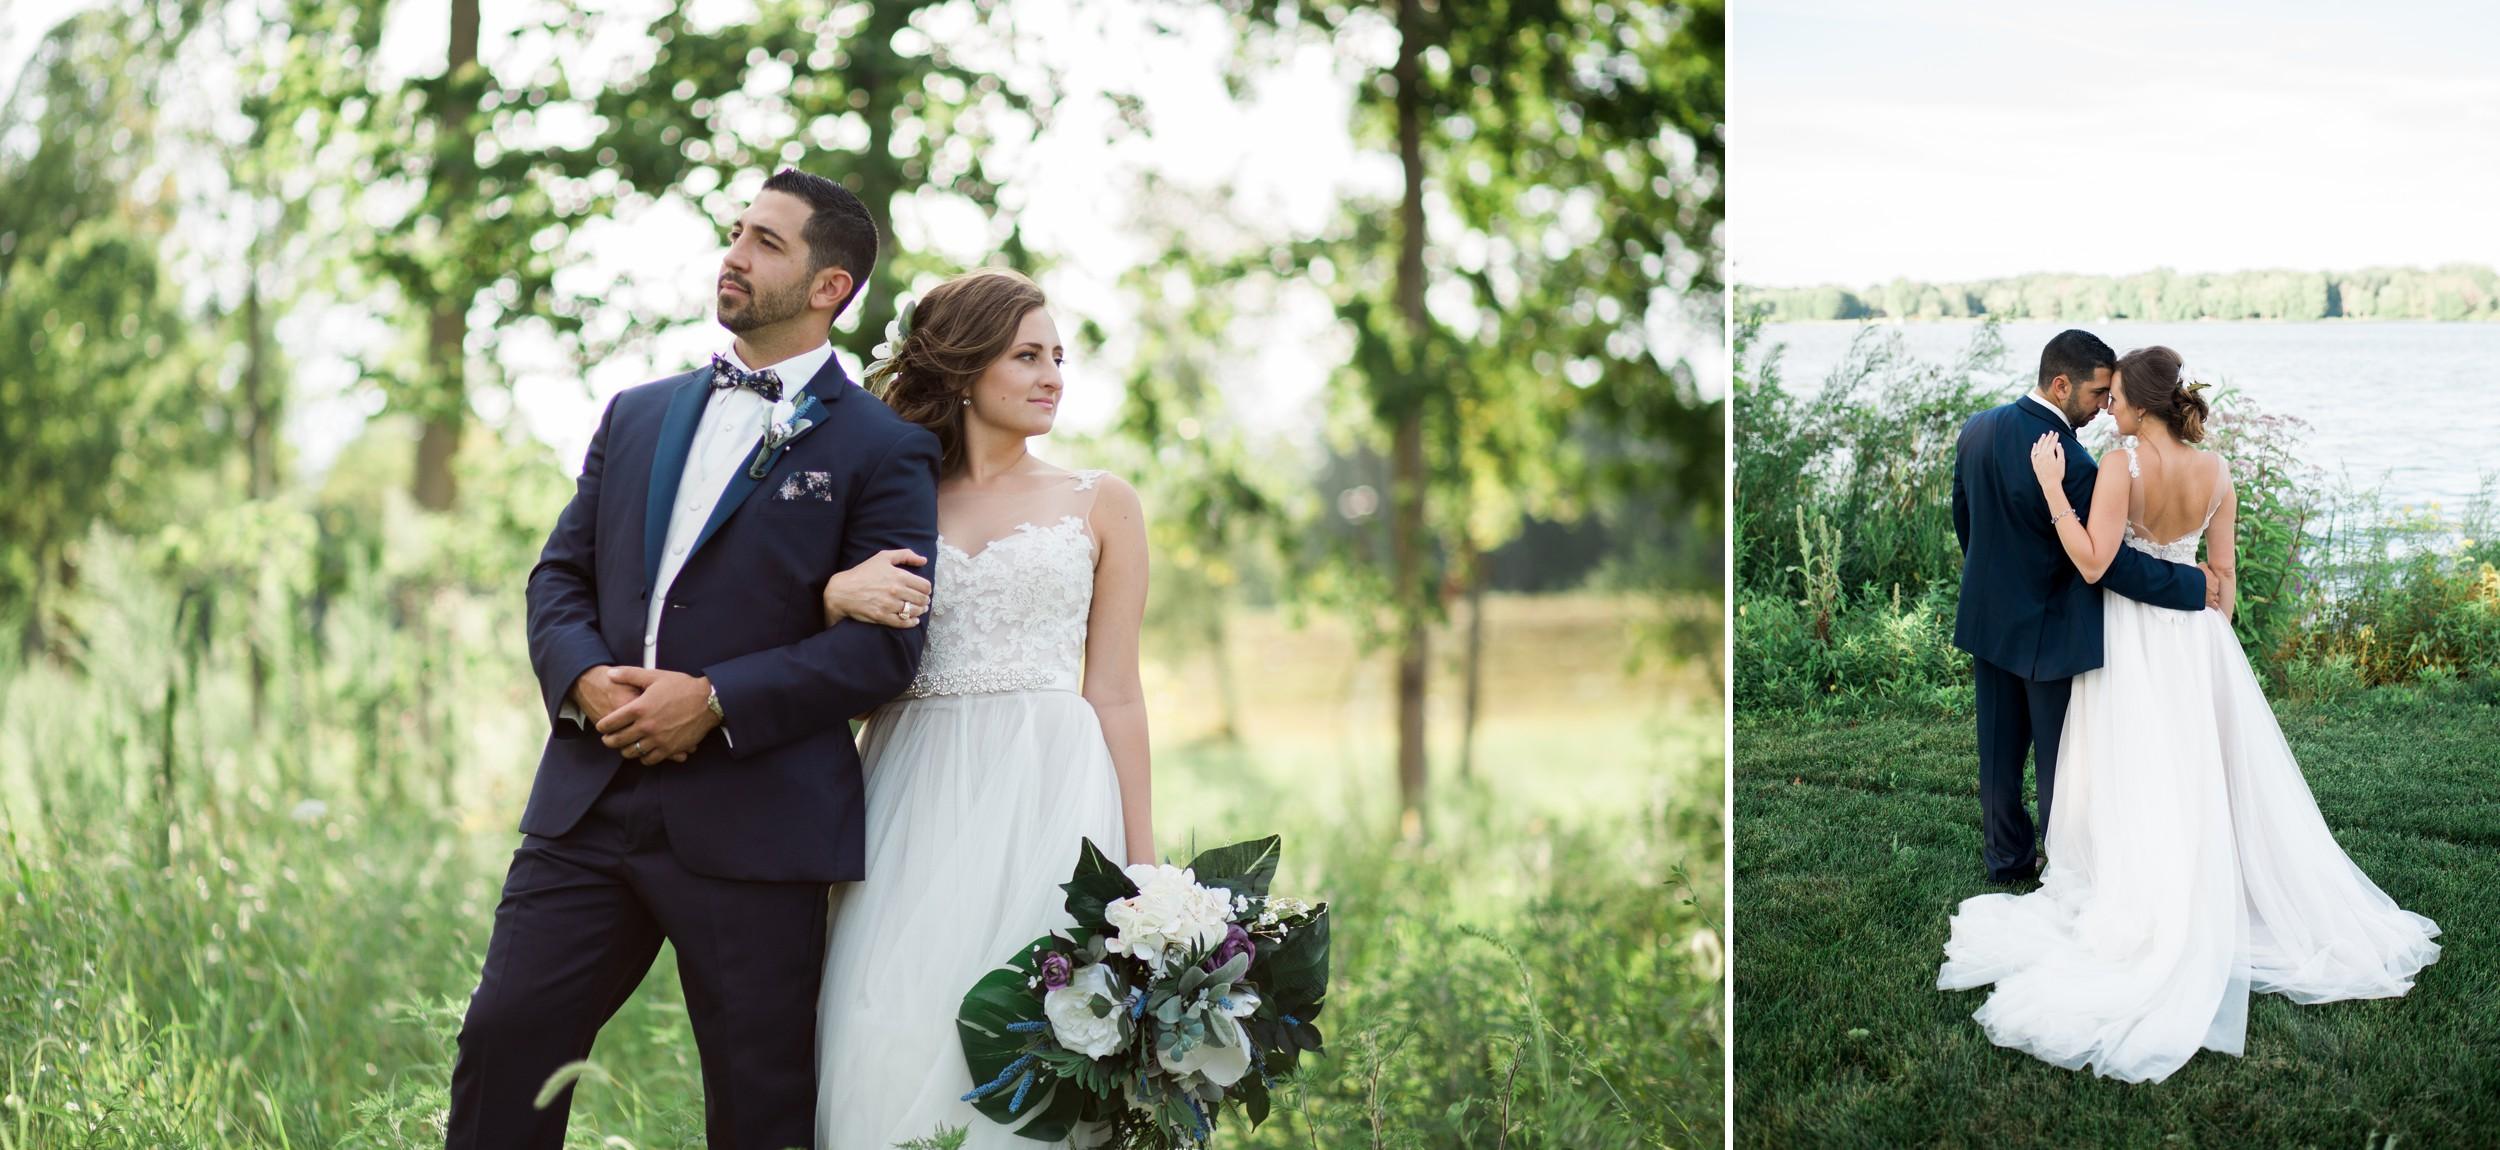 Nick-and-martina-pinelake-vinyards-wedding-columbiana-ohio-tracylynn-photography 15.jpg